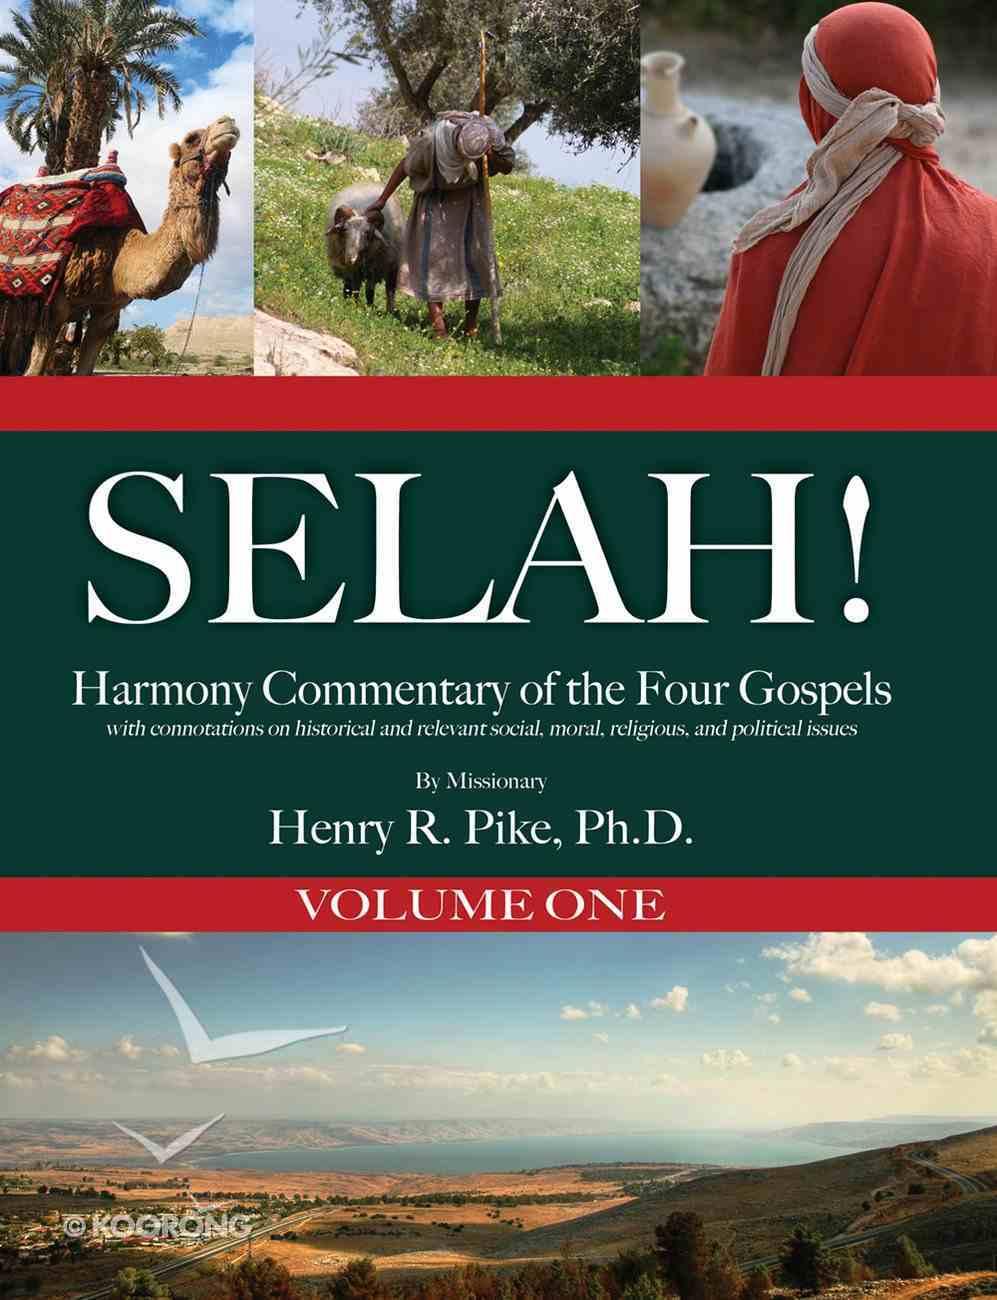 Selah! Harmony Commentary of the Four Gospels, Ebook Volume 1 eBook